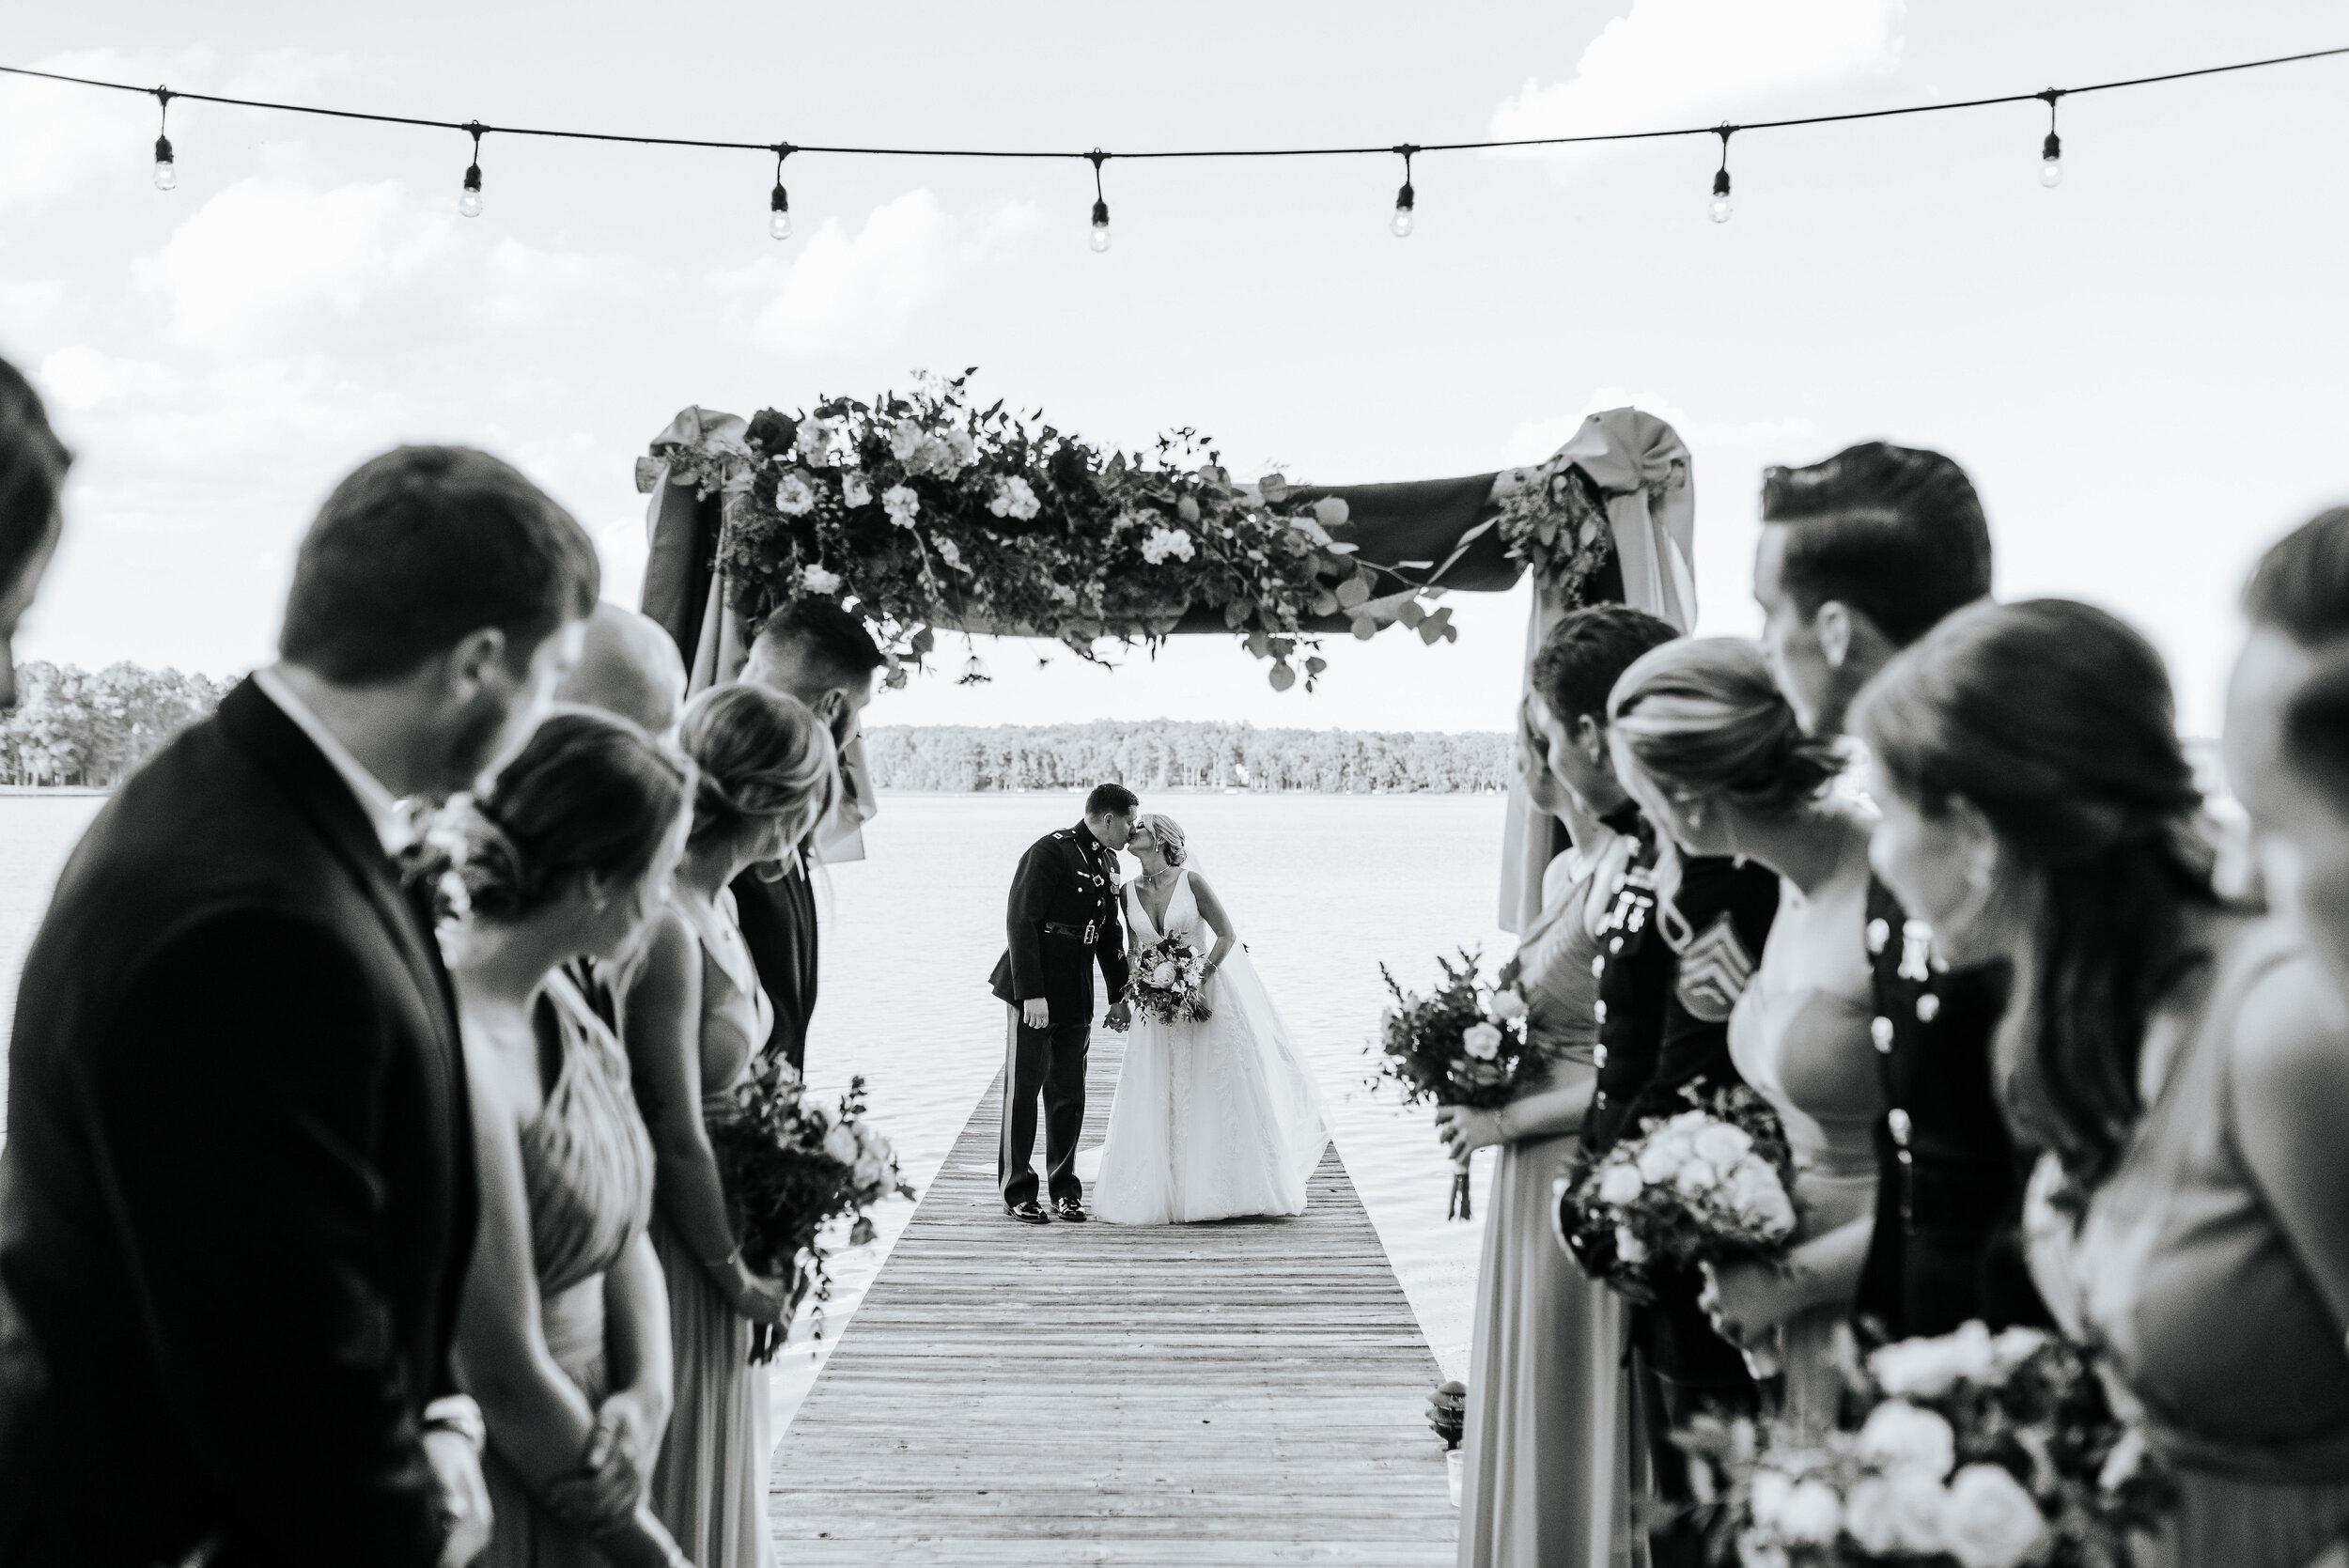 Emily_Mike_Wedding_Celebrations_at_the_Reservoir_Pool_Pavilion_Richmond_Virginia_Wedding_Photographer_Photography_by_V_63.jpg